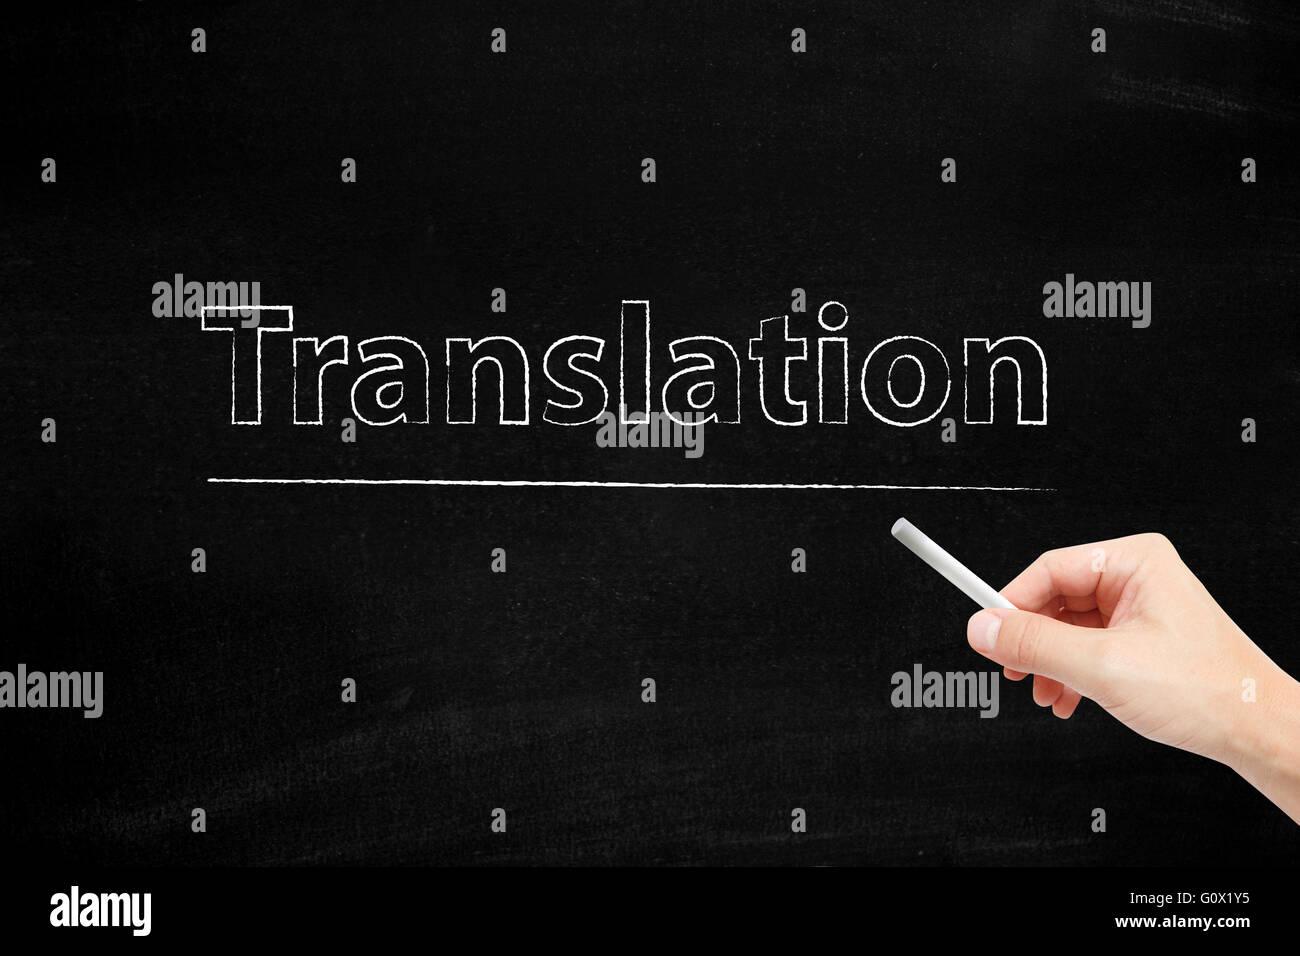 Translation written with chalk - Stock Image